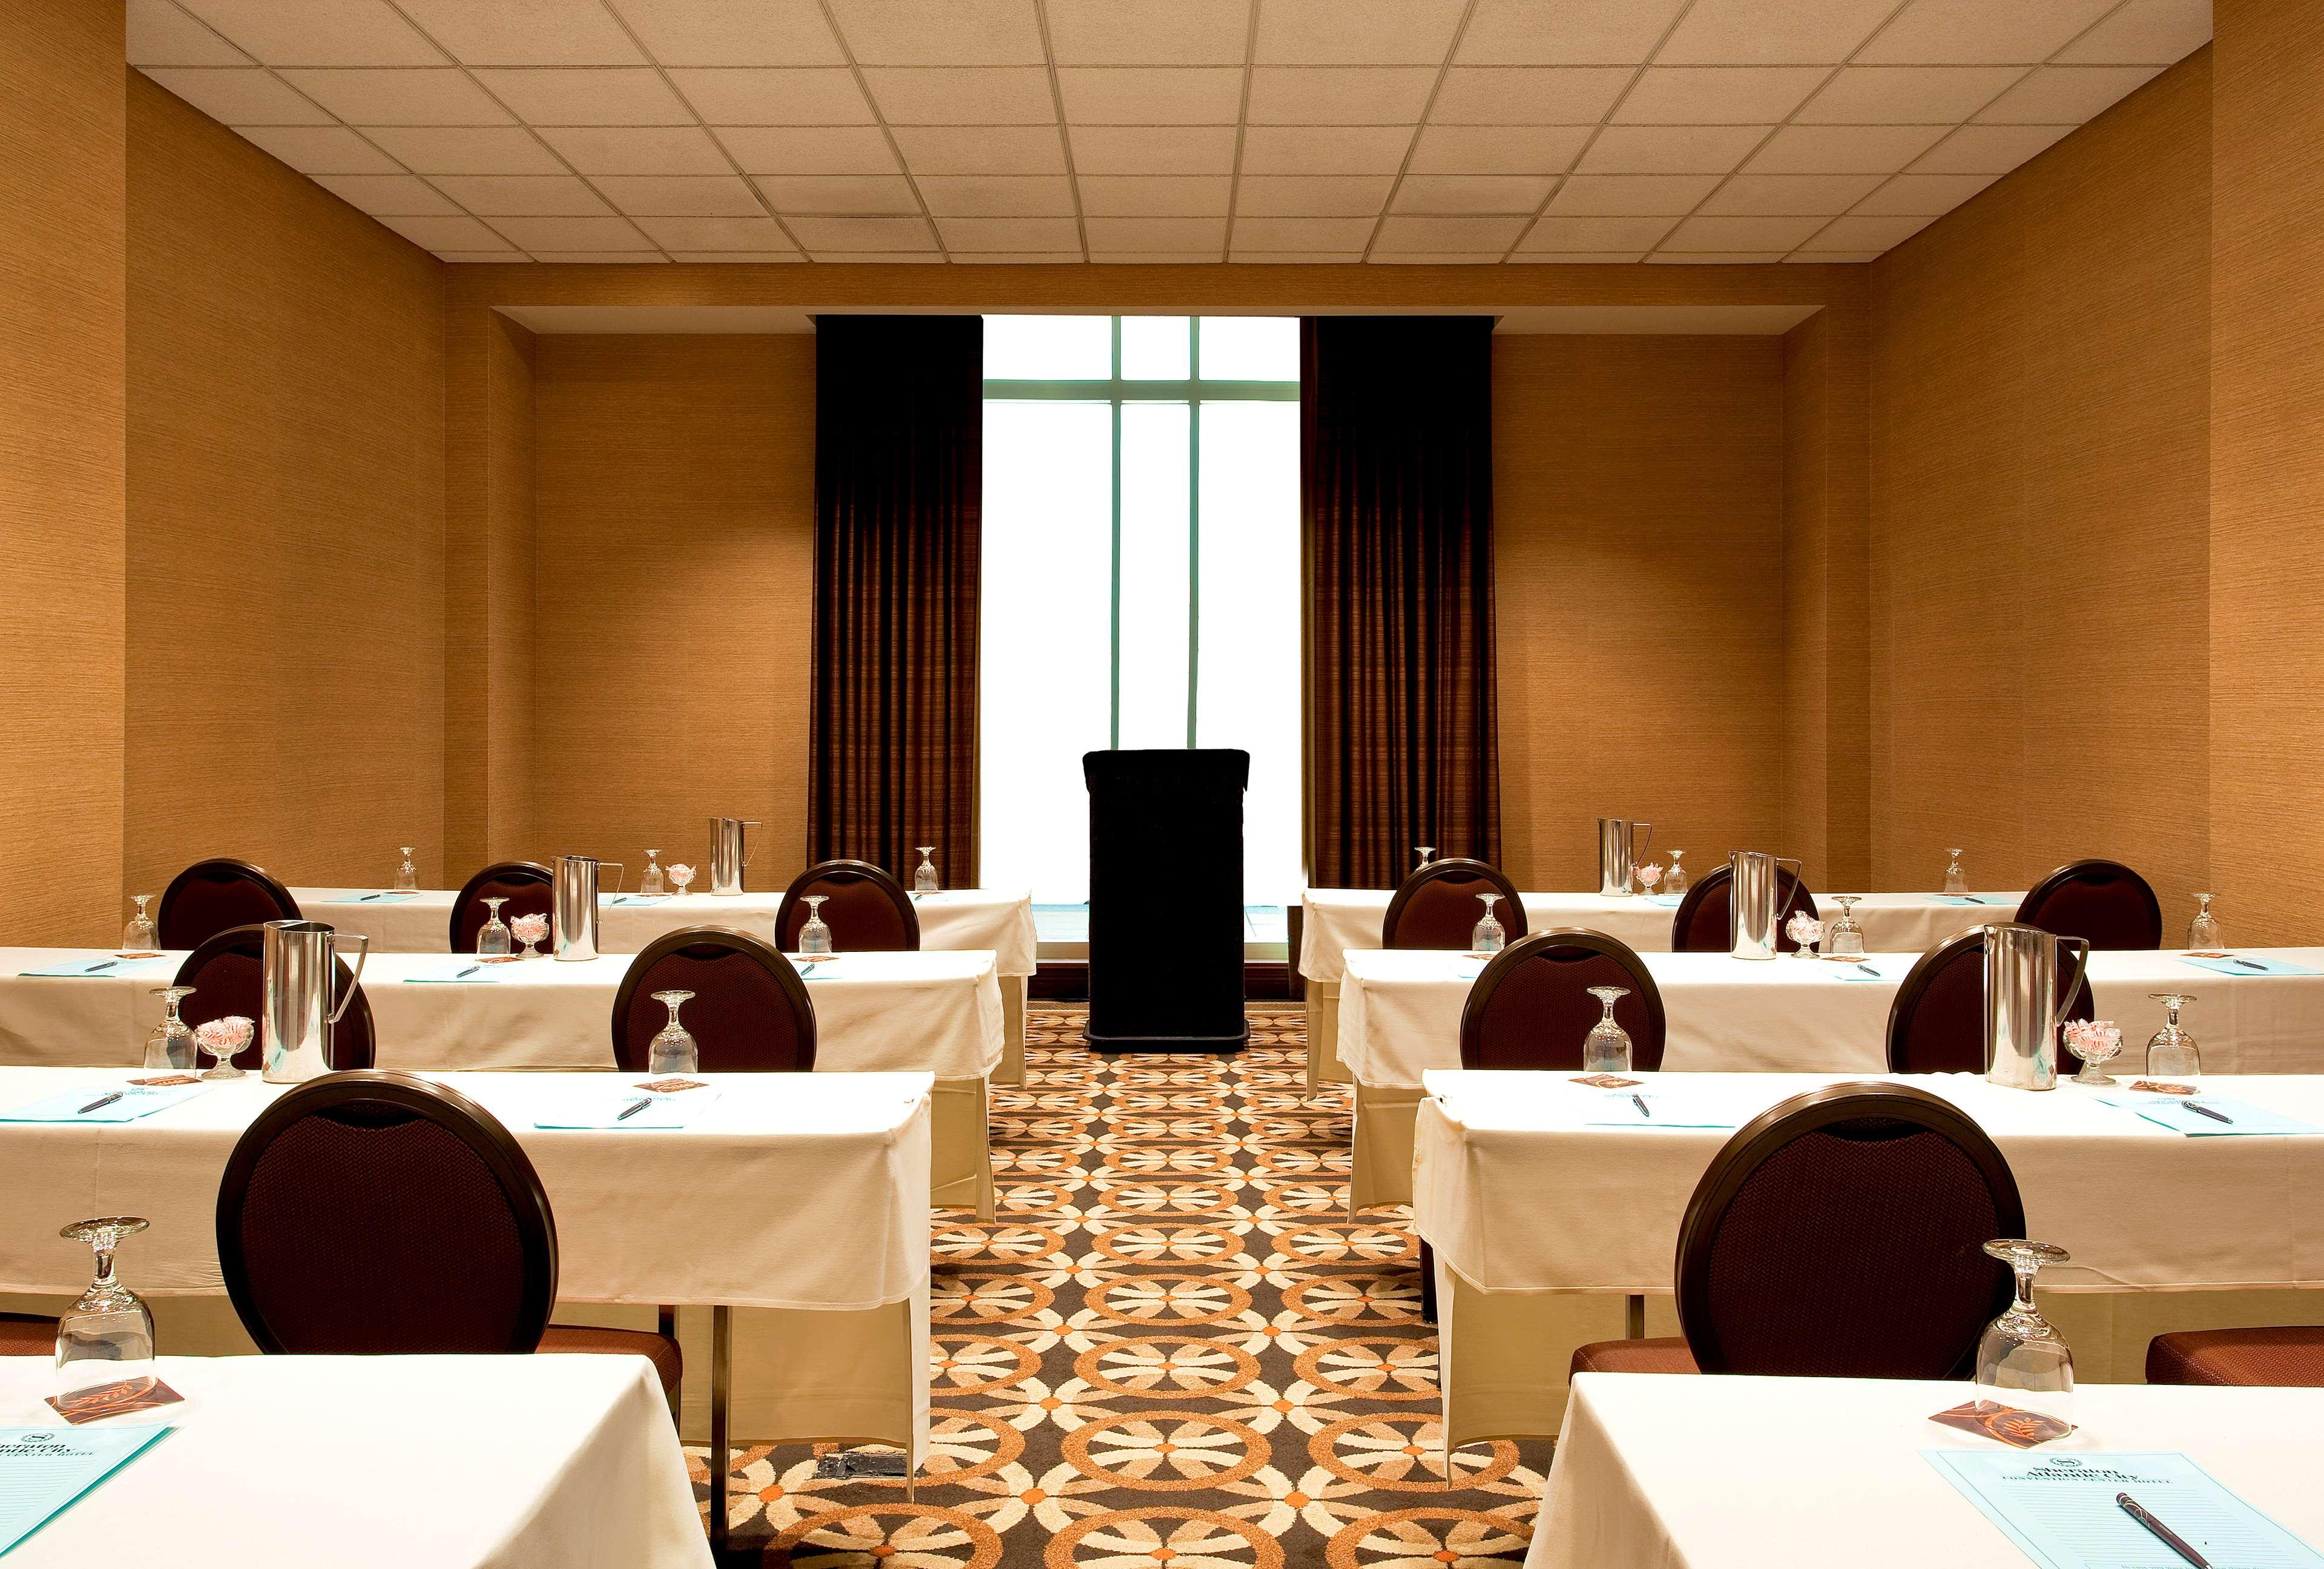 Sheraton Atlantic City Convention Center Hotel image 15